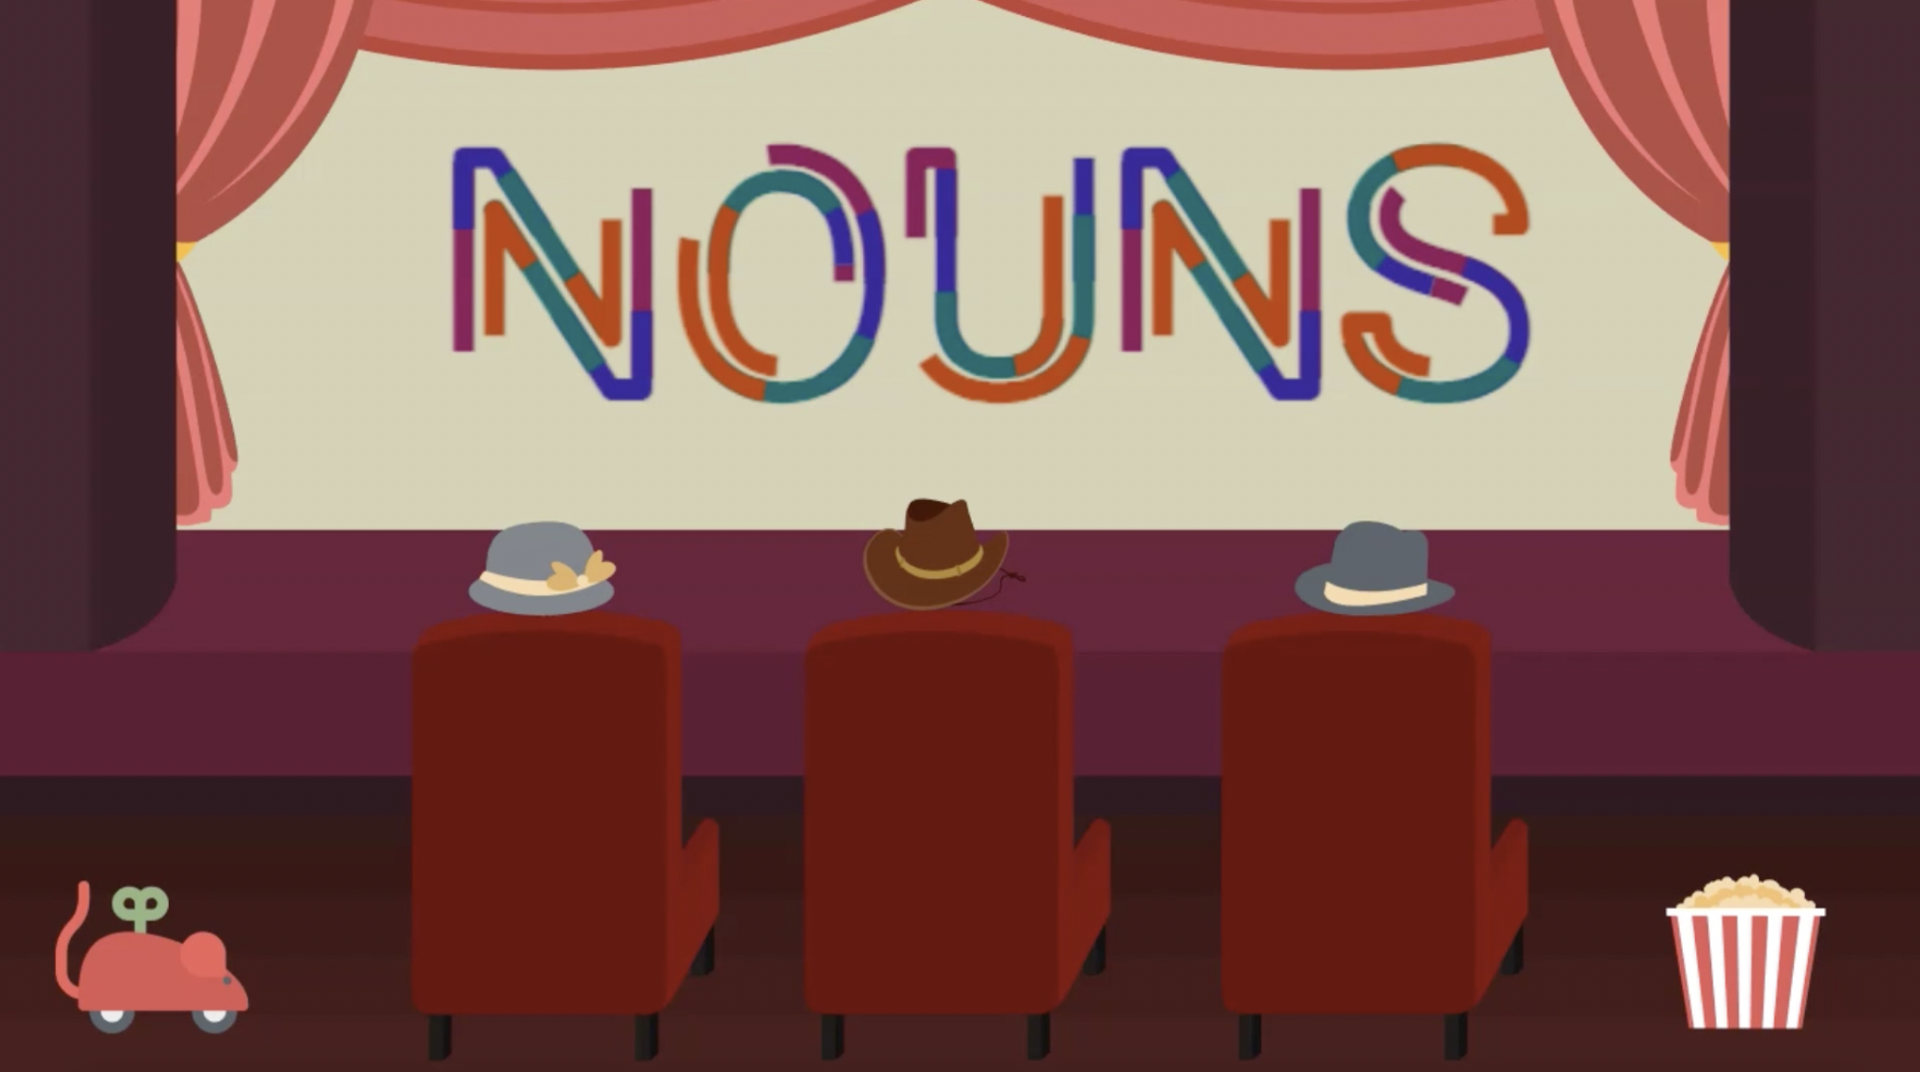 Nouns Cartoon People Watching a Movie Screen